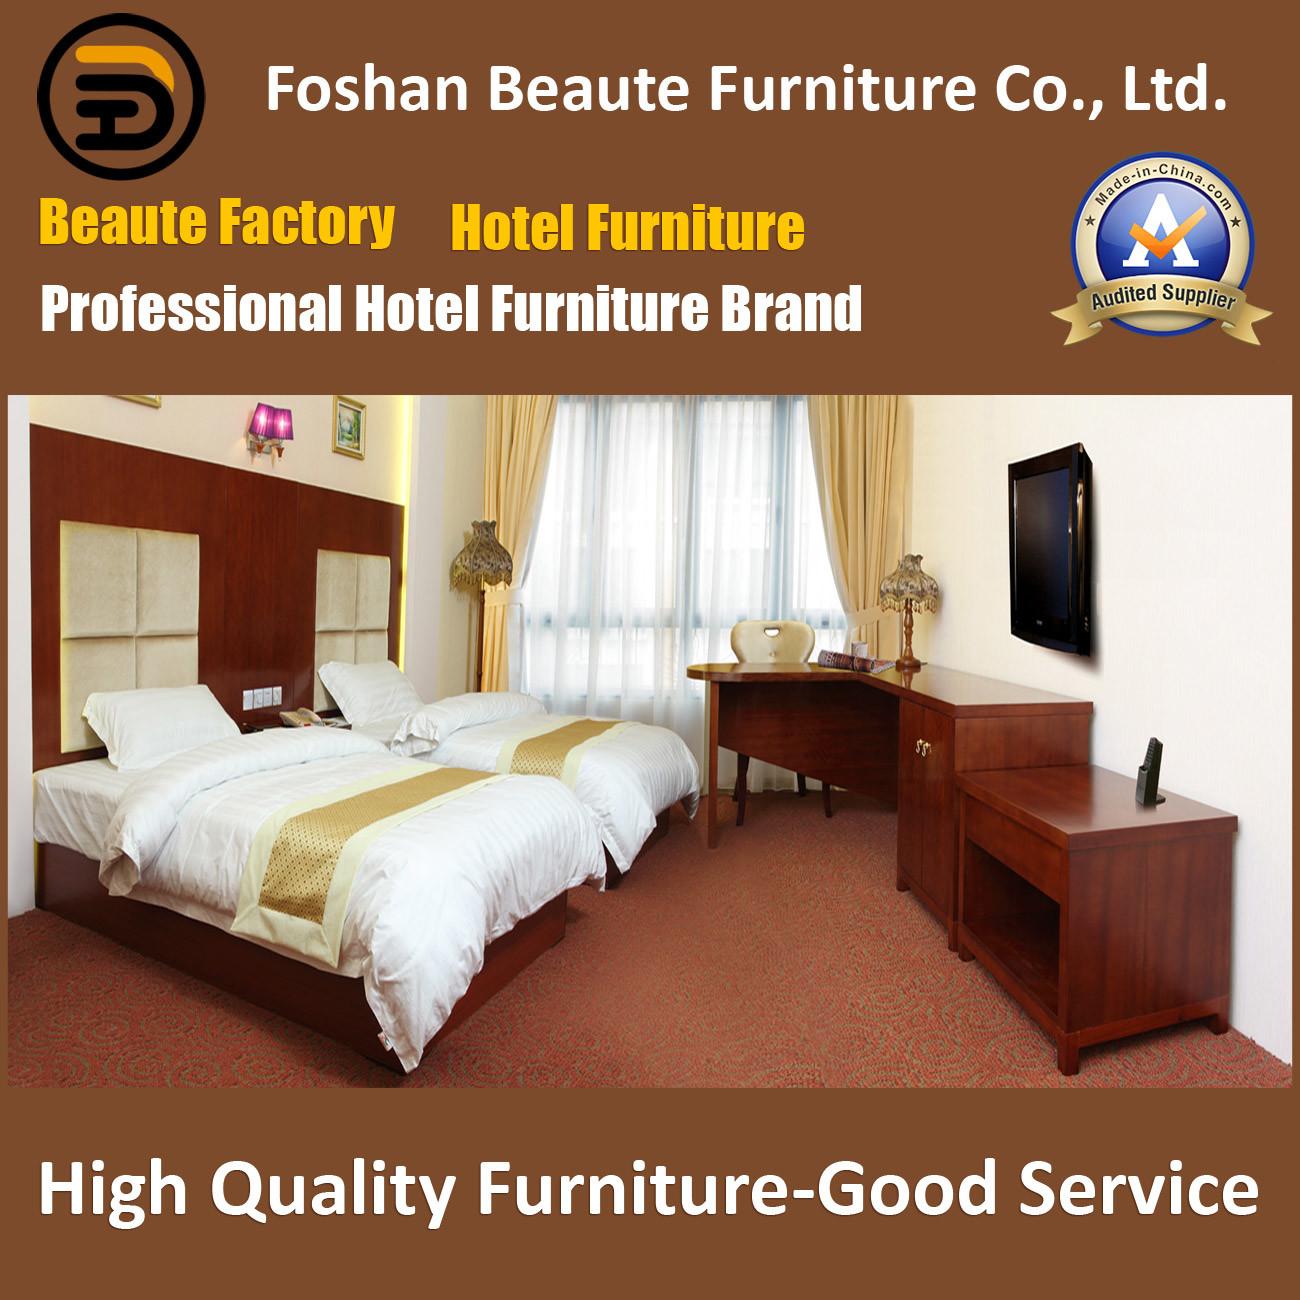 Hotel Furniture/Luxury Double Bedroom Furniture/Standard Hotel Double Bedroom Suite/Double Hospitality Guest Room Furniture (GLB-0109862)